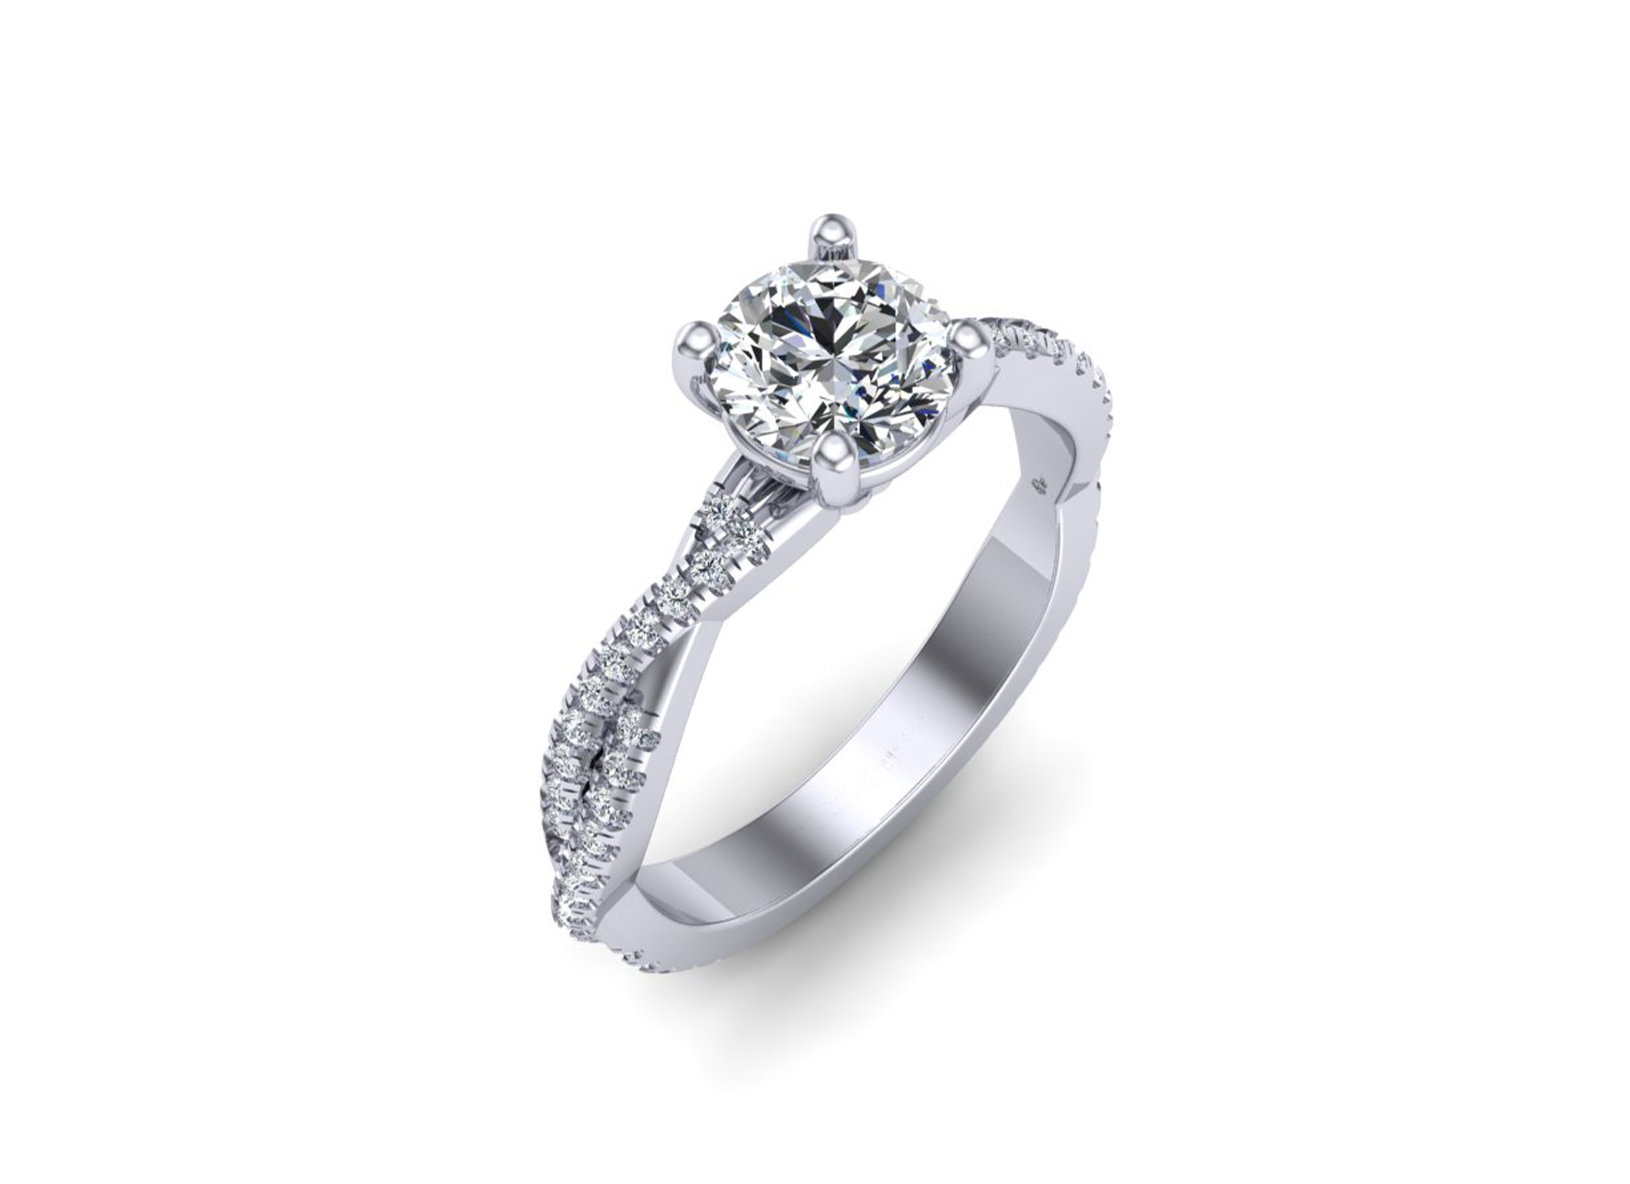 Stephanie's custom ring